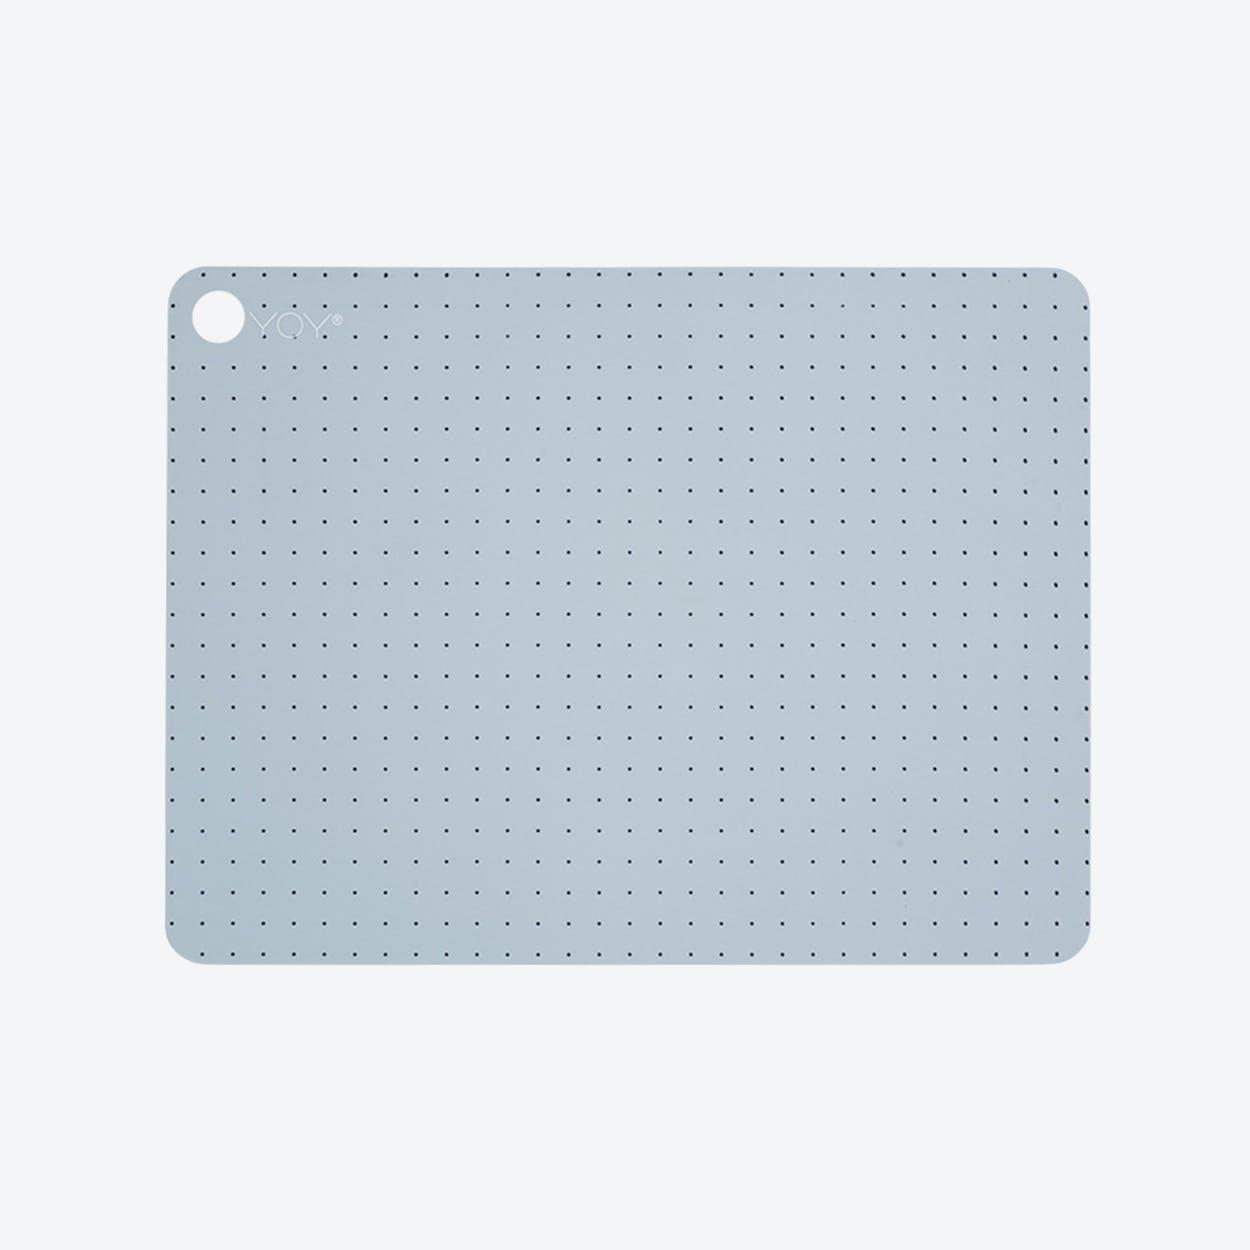 Placemats Grid Dotin Pale Grey Blue (Set of 2)